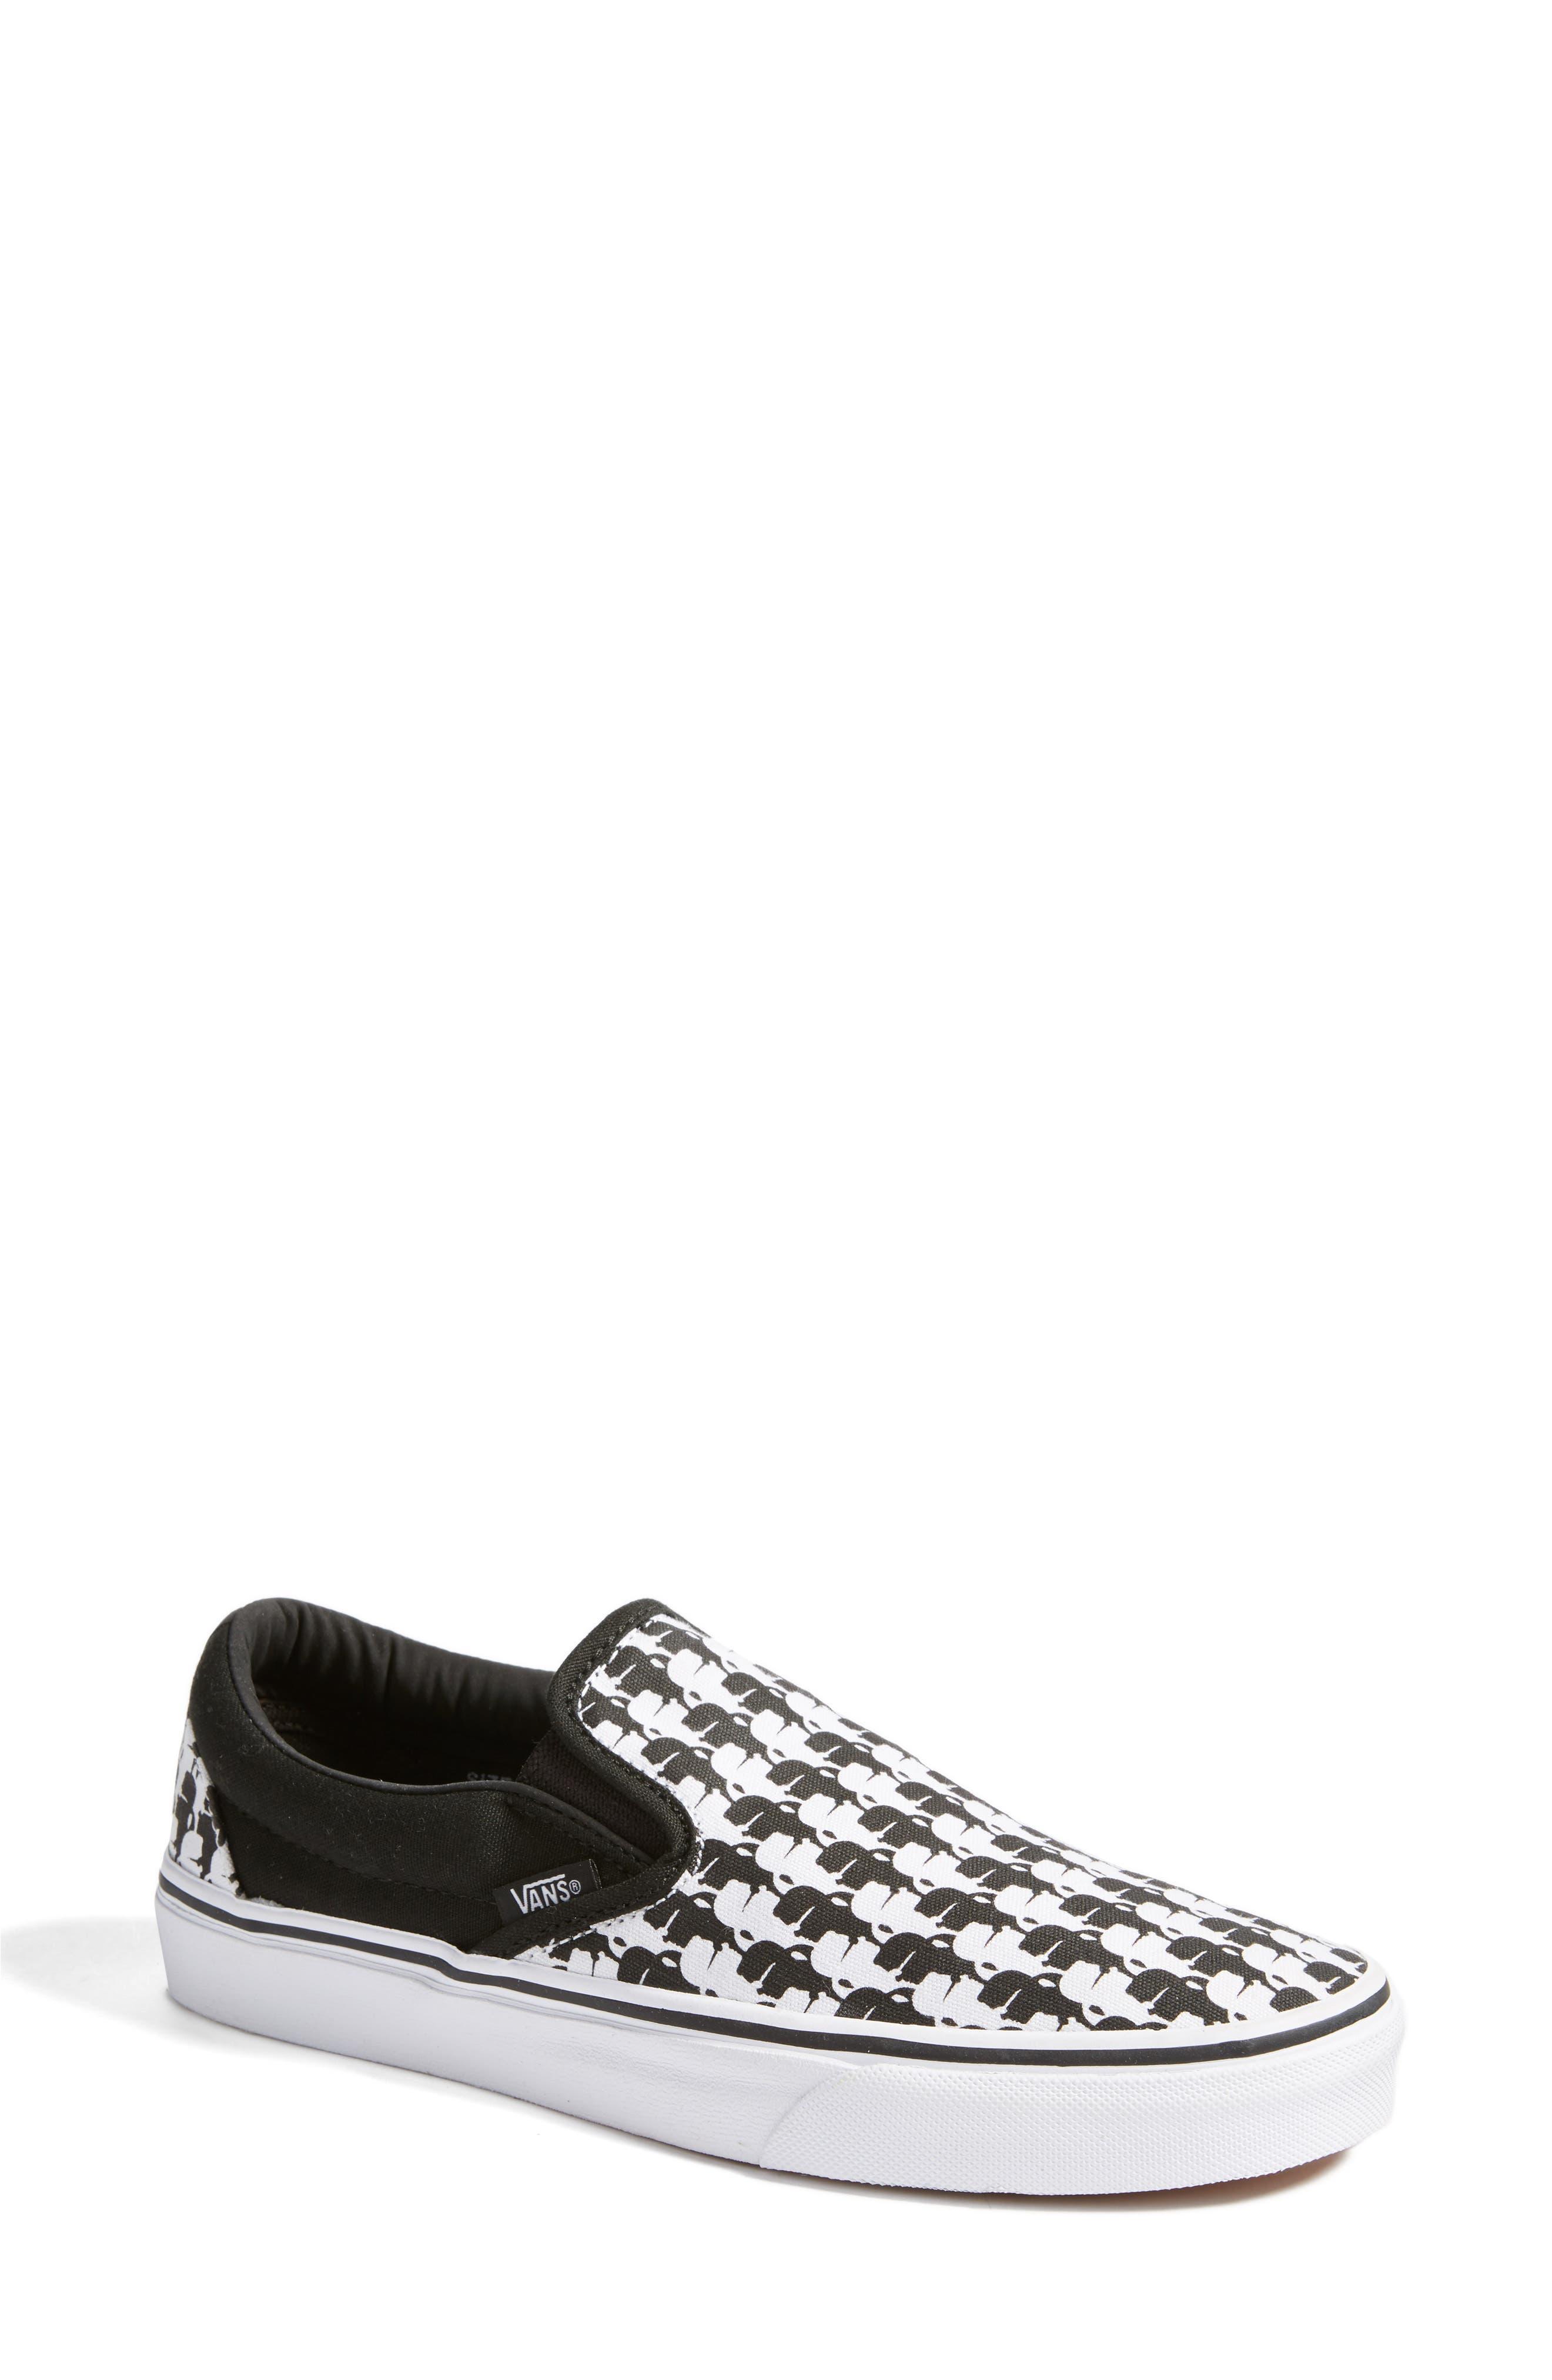 Alternate Image 1 Selected - Vans x KARL LAGERFELD Houndstooth Slip-On Sneaker (Women)